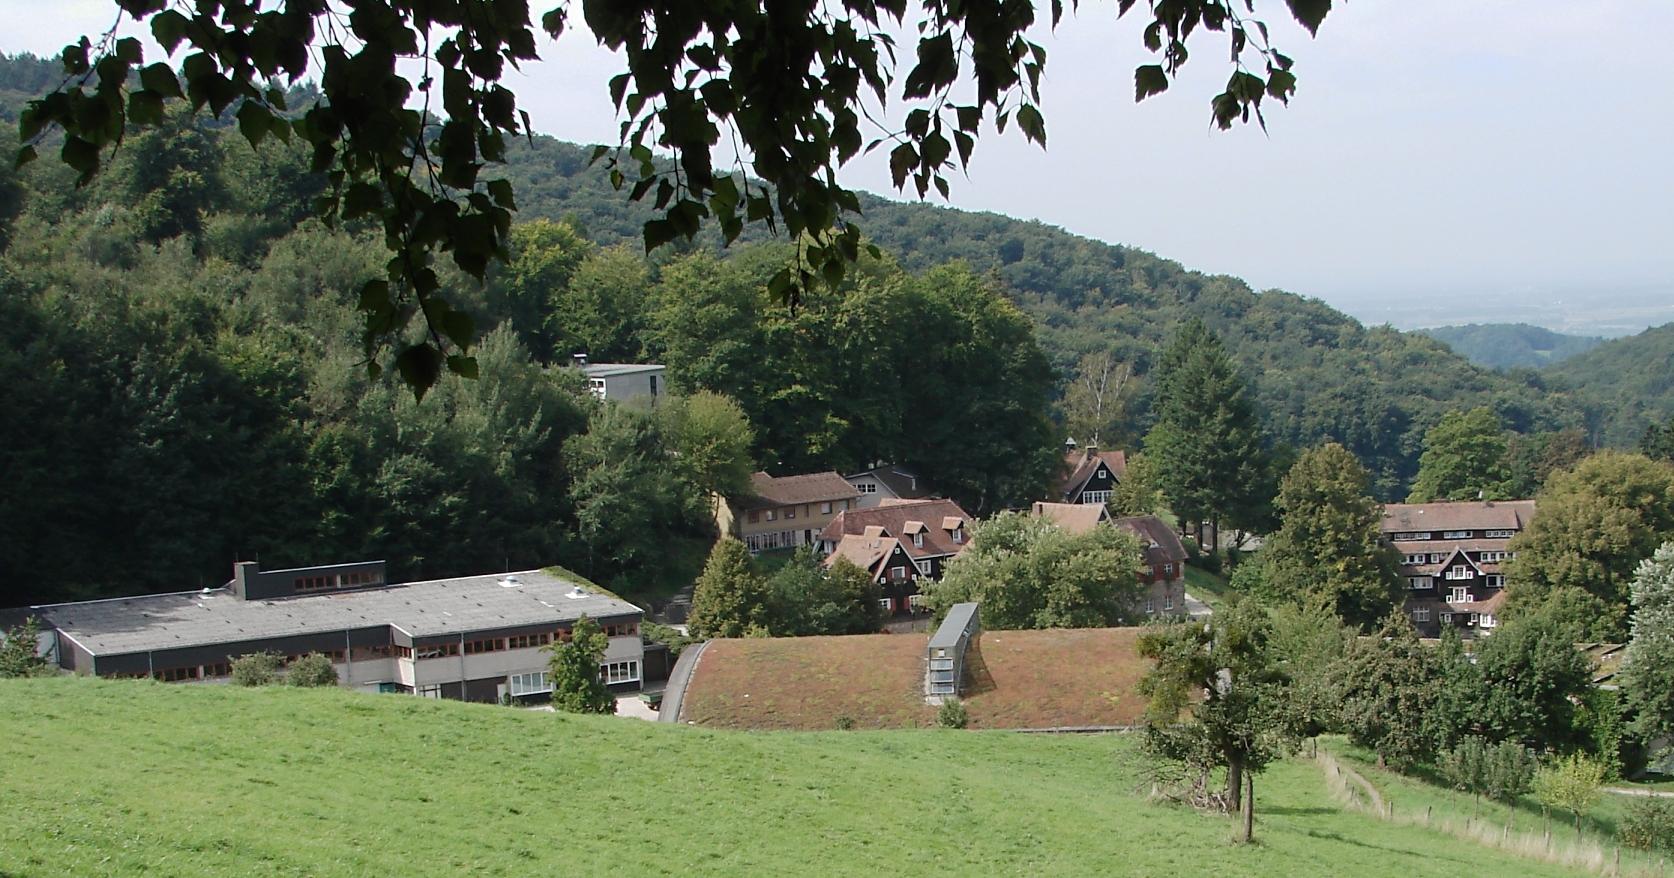 Die Odenwaldschule in Heppenheim-Oberhambach